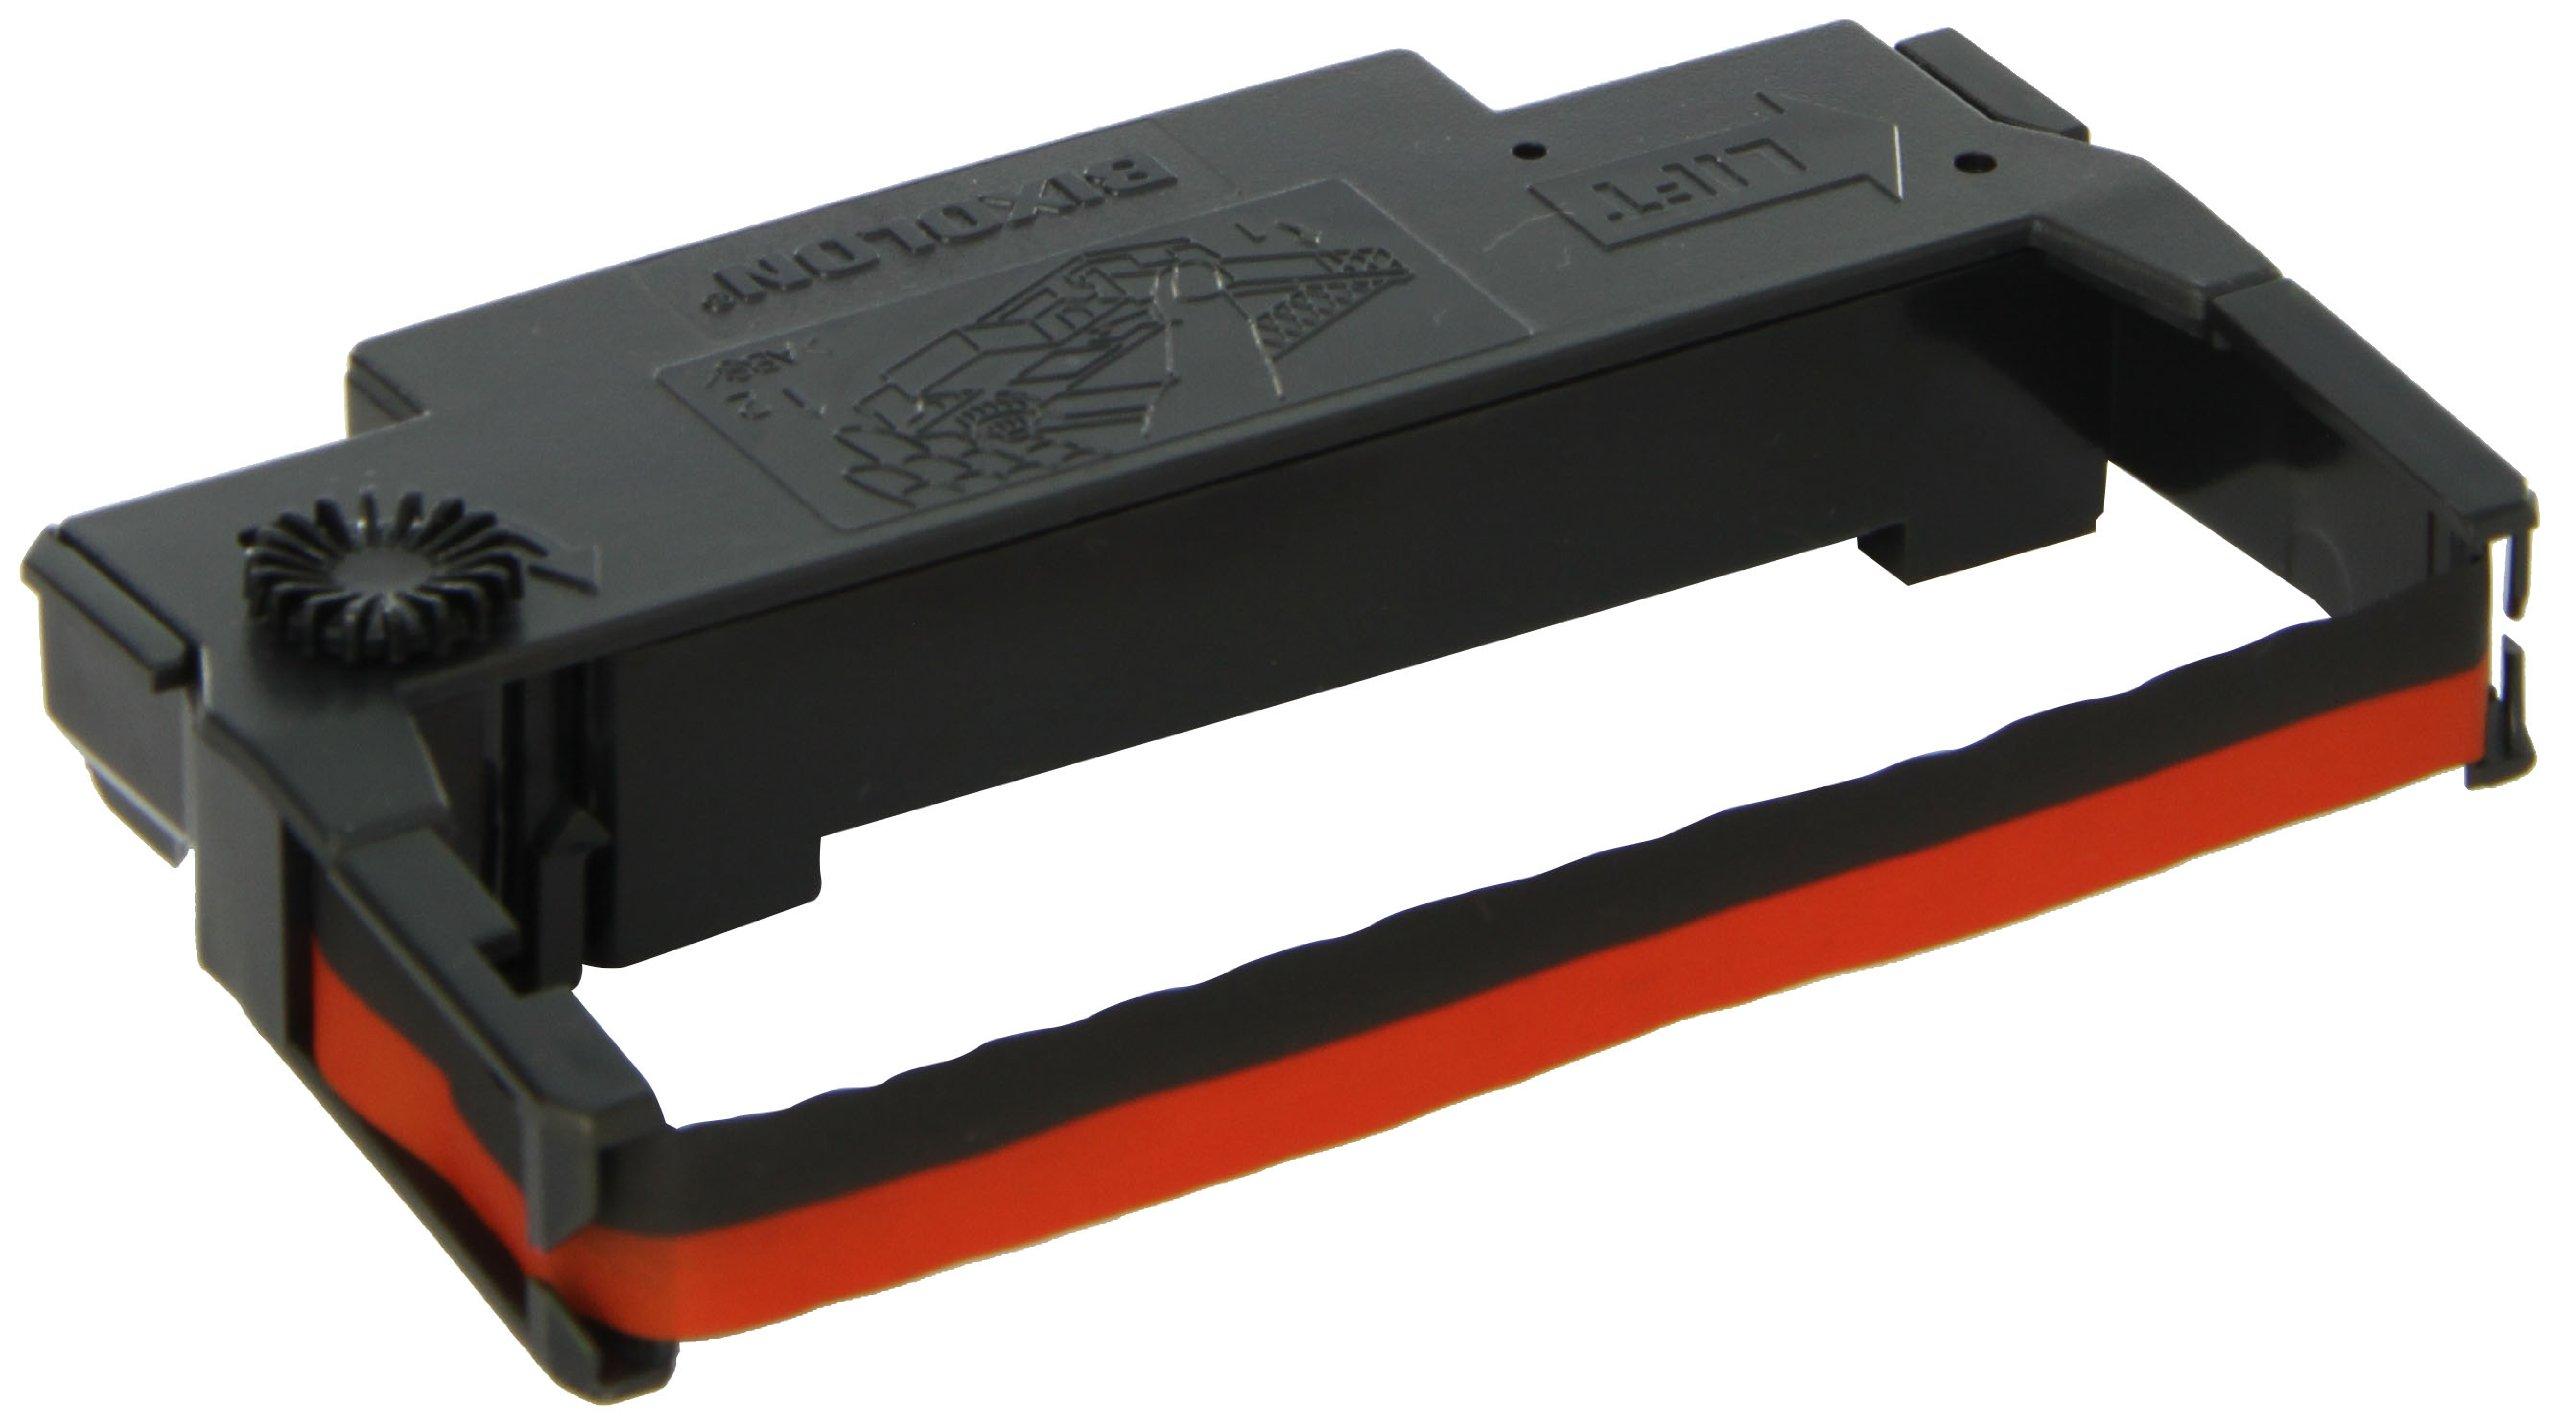 Bixolon RRC-201BR Ribbon Cartridge For SRP-270/SRP-275 Printer, Black/Red by BIXOLON (Image #1)